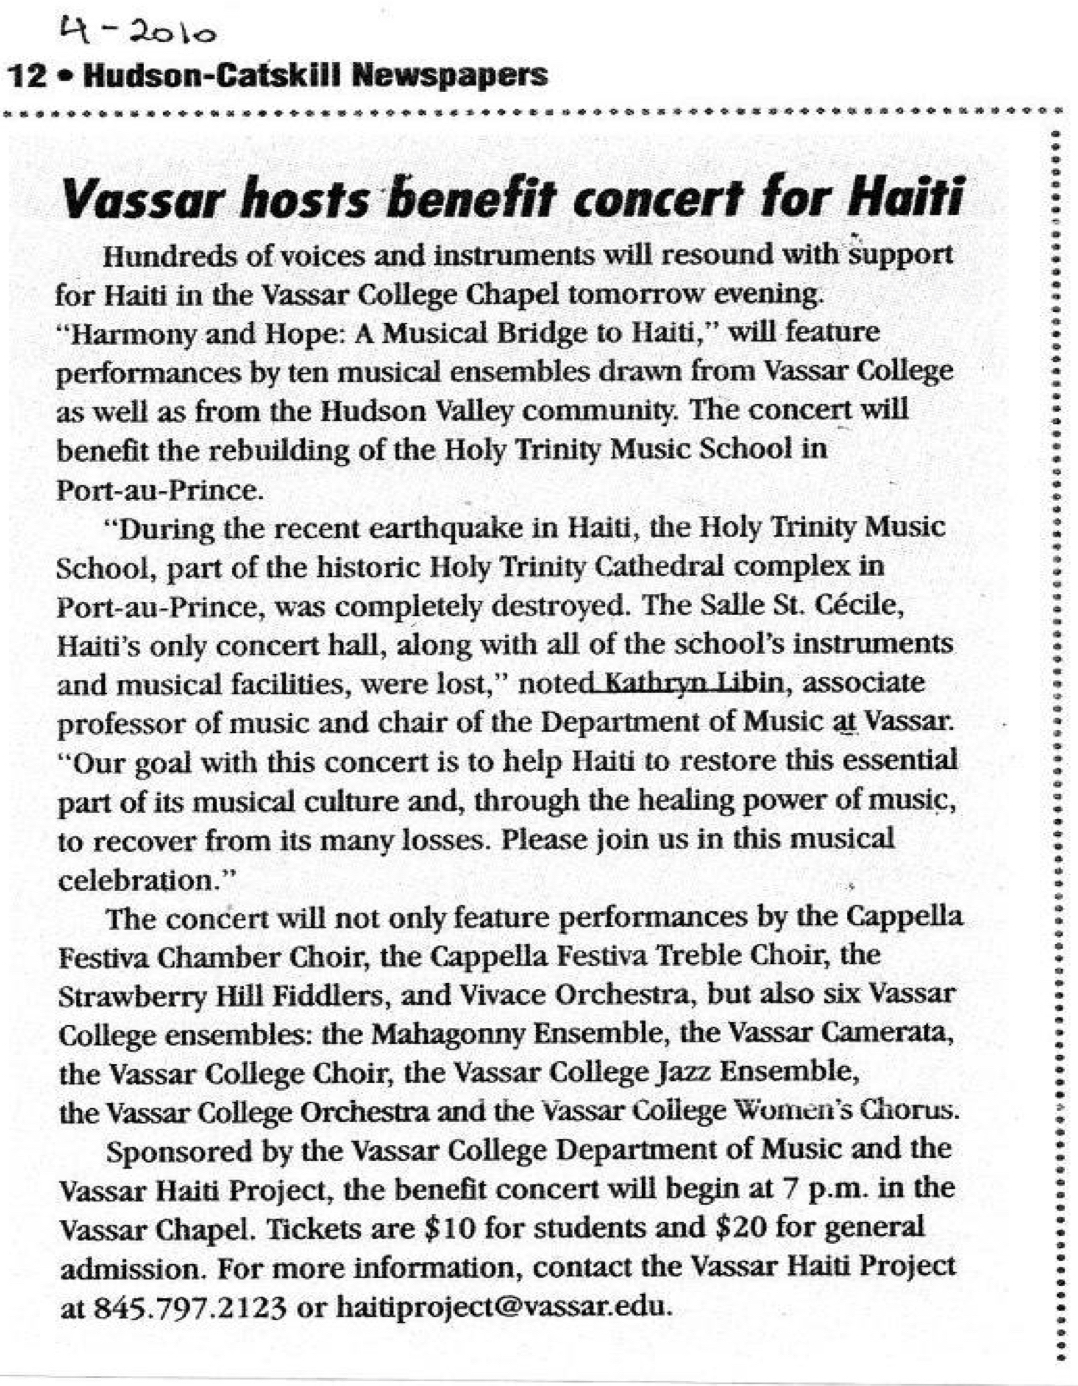 VHP Page 29.jpg